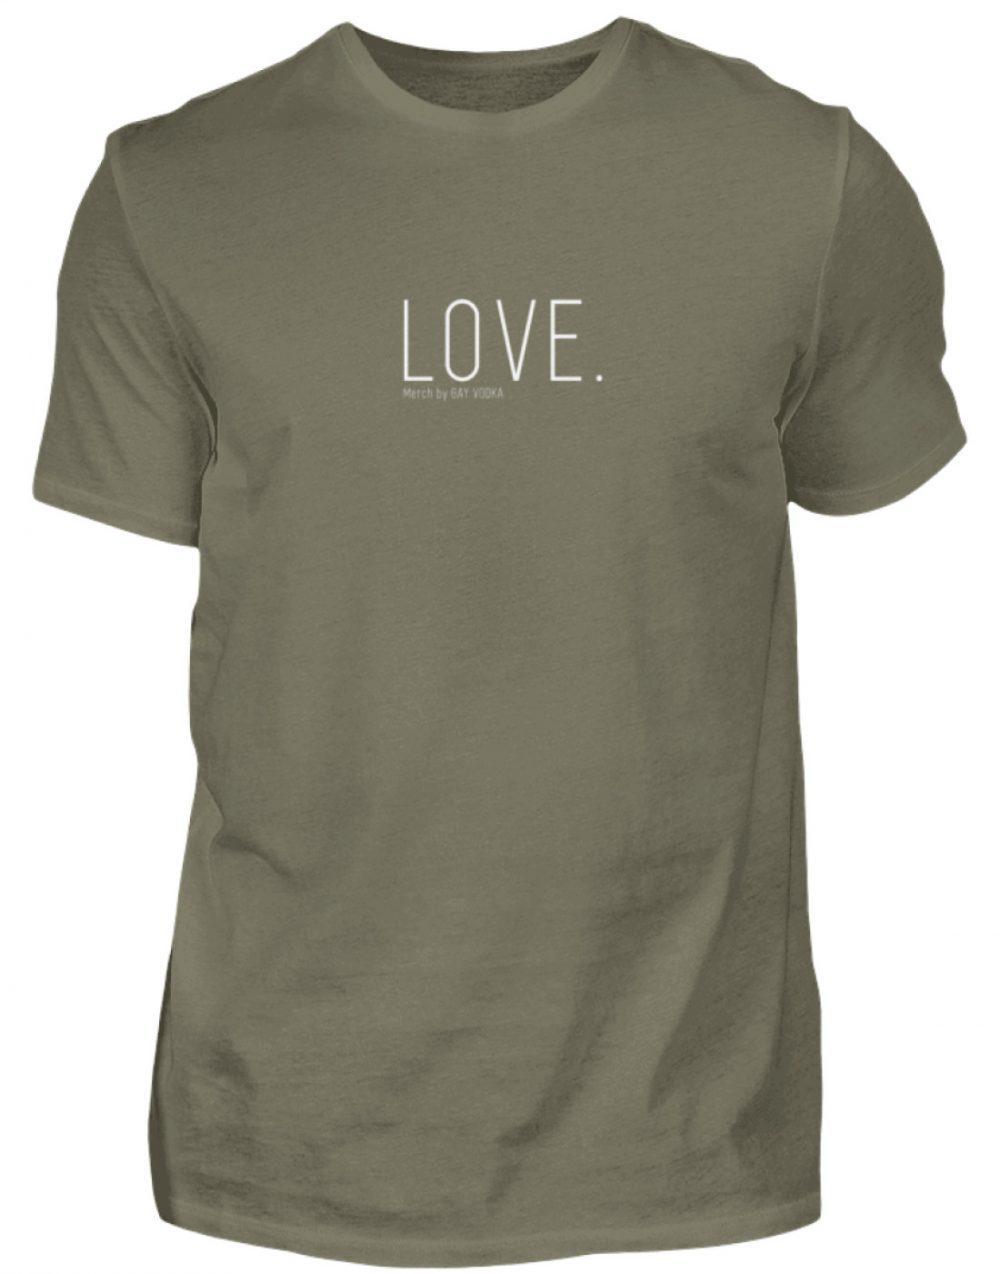 LOVE. - Herren Premiumshirt-627